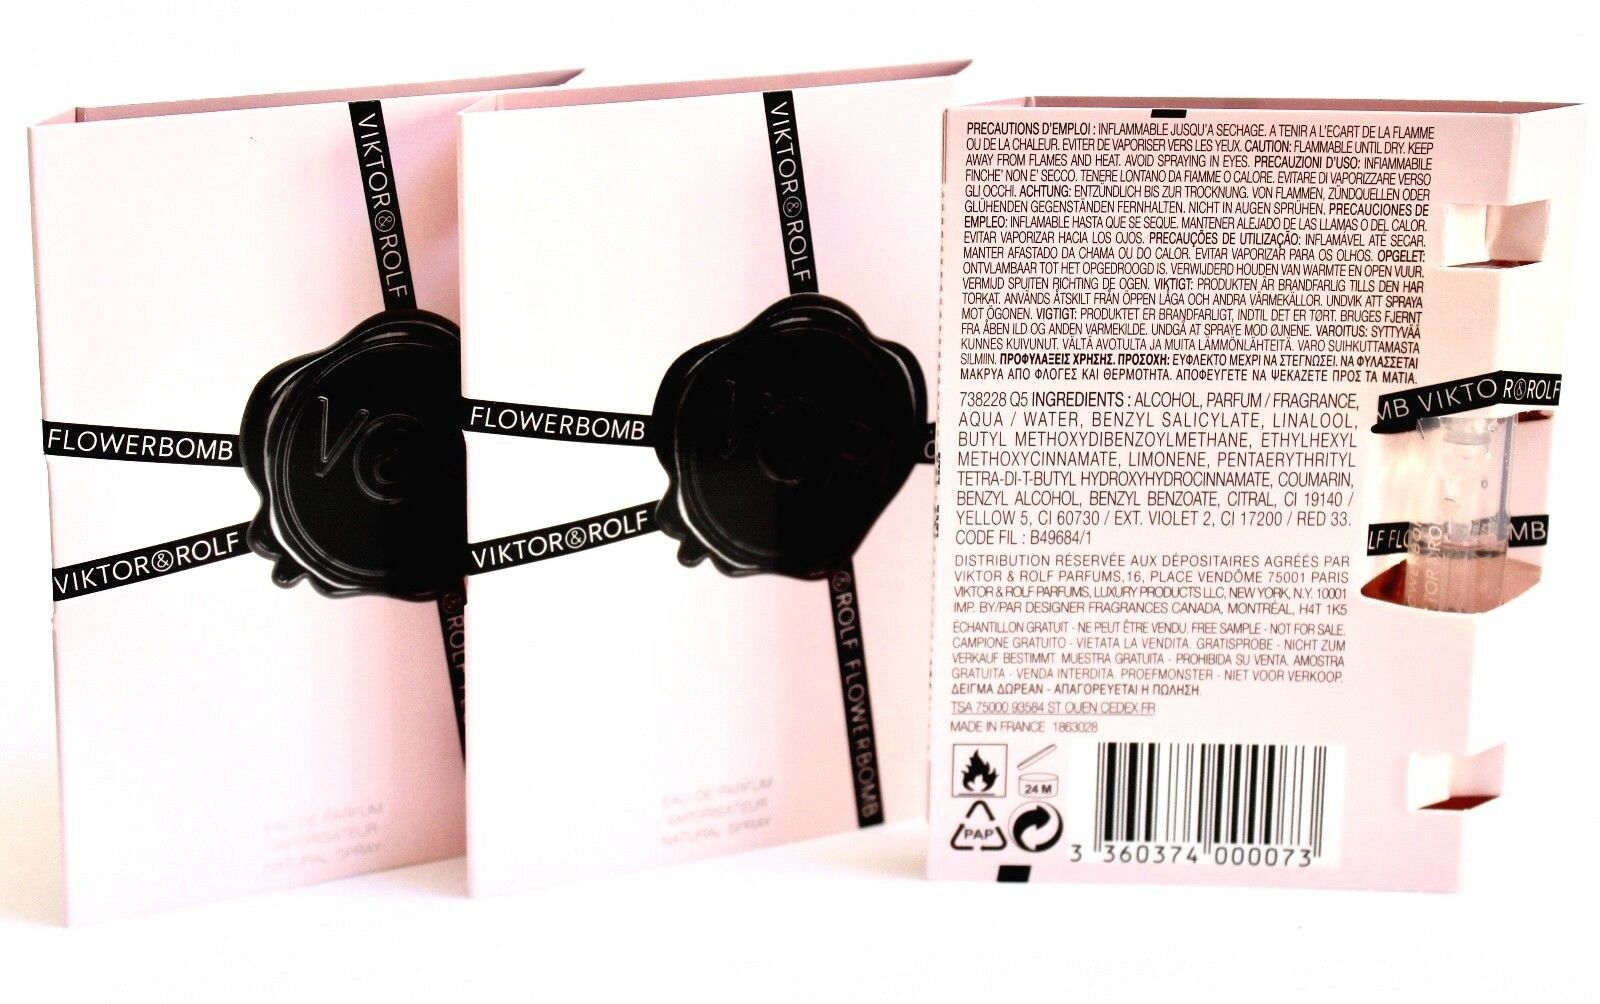 Viktor Rolf 3x Flowerbomb 1x Bonbon Edp Sample Spray Vials Ebay